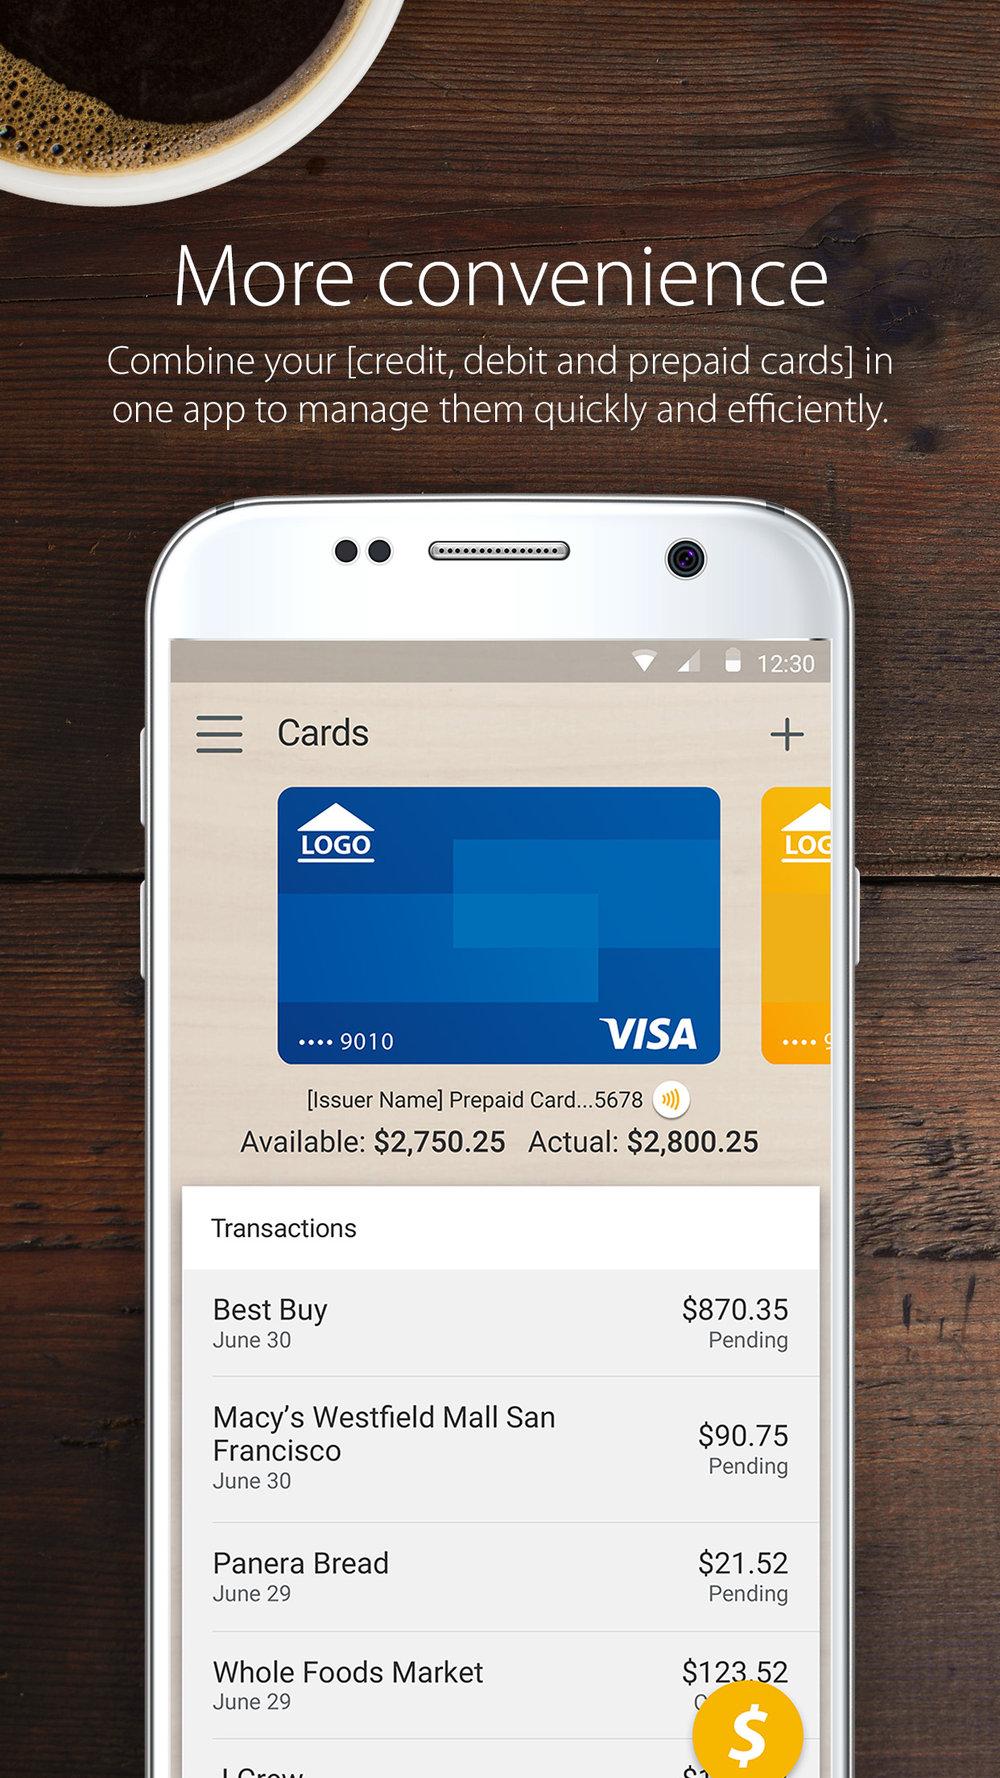 Visa-AppStore-_0003_2 Android.jpg